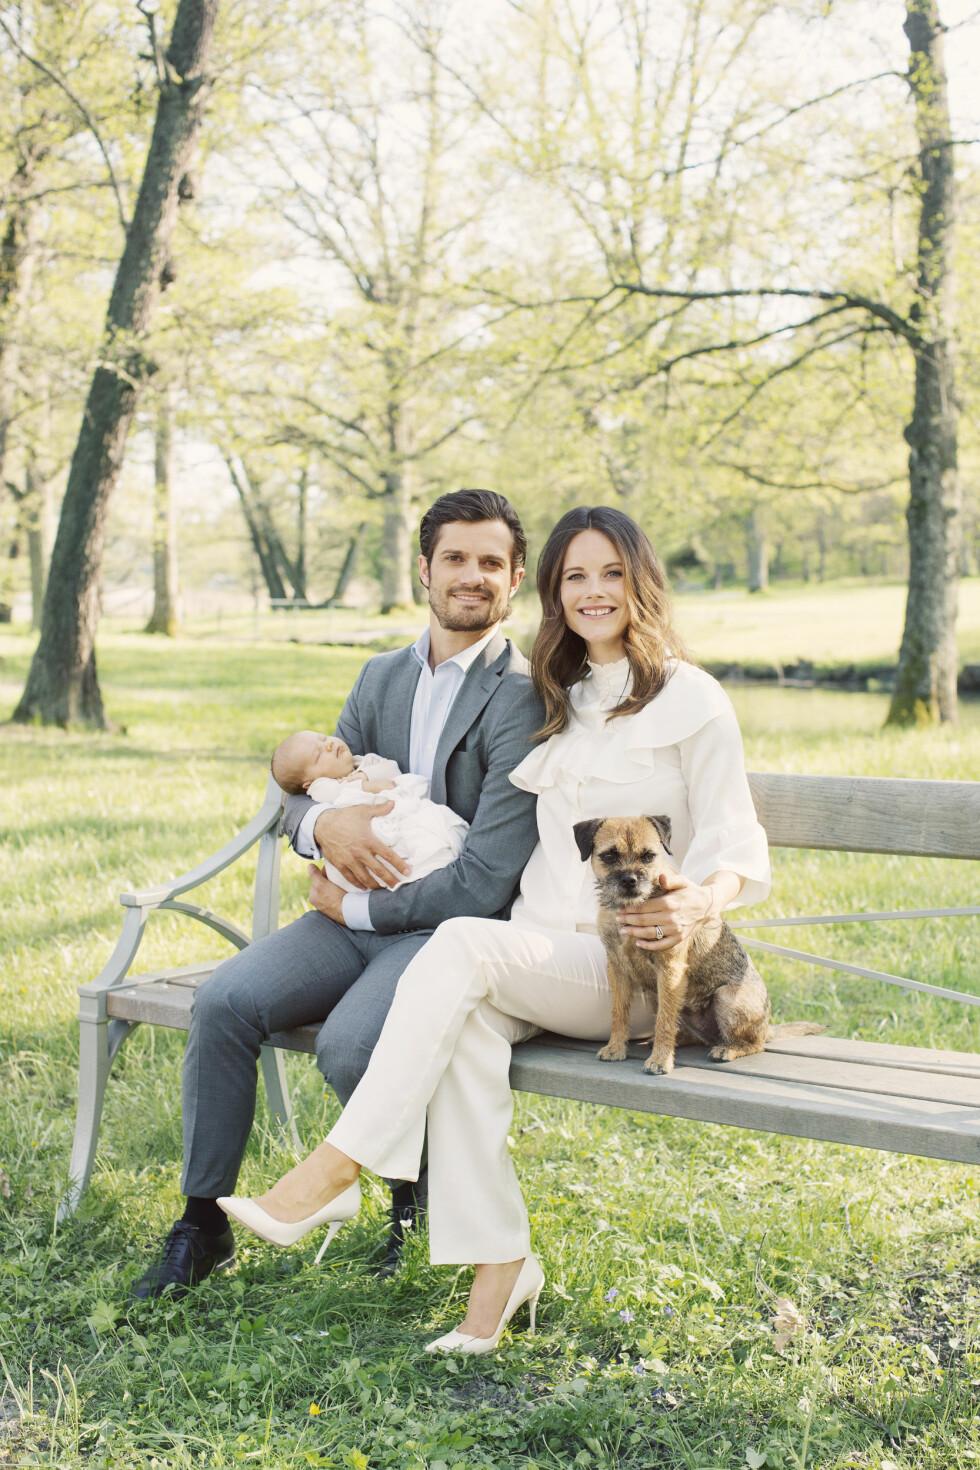 FAMILIEIDYLL: Prins Carl Philip, pinsesse Sofia og prins Alexander nyter en vakker maidag i slottsparken på Drottningholm sammen med hunden sin. Foto: Erika Gerdemark, Kungahuset.se